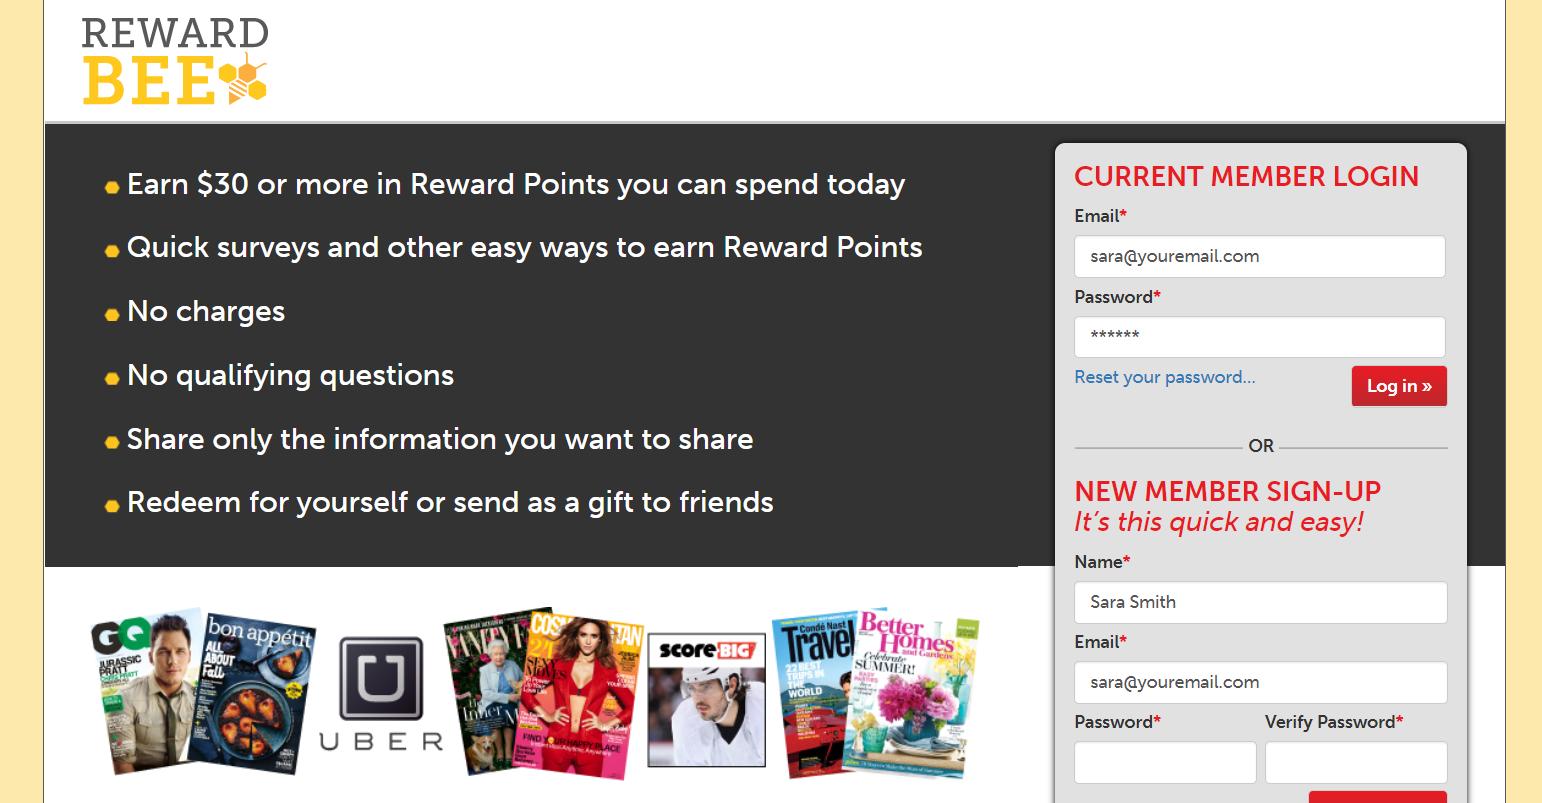 Is Reward Bee a scam